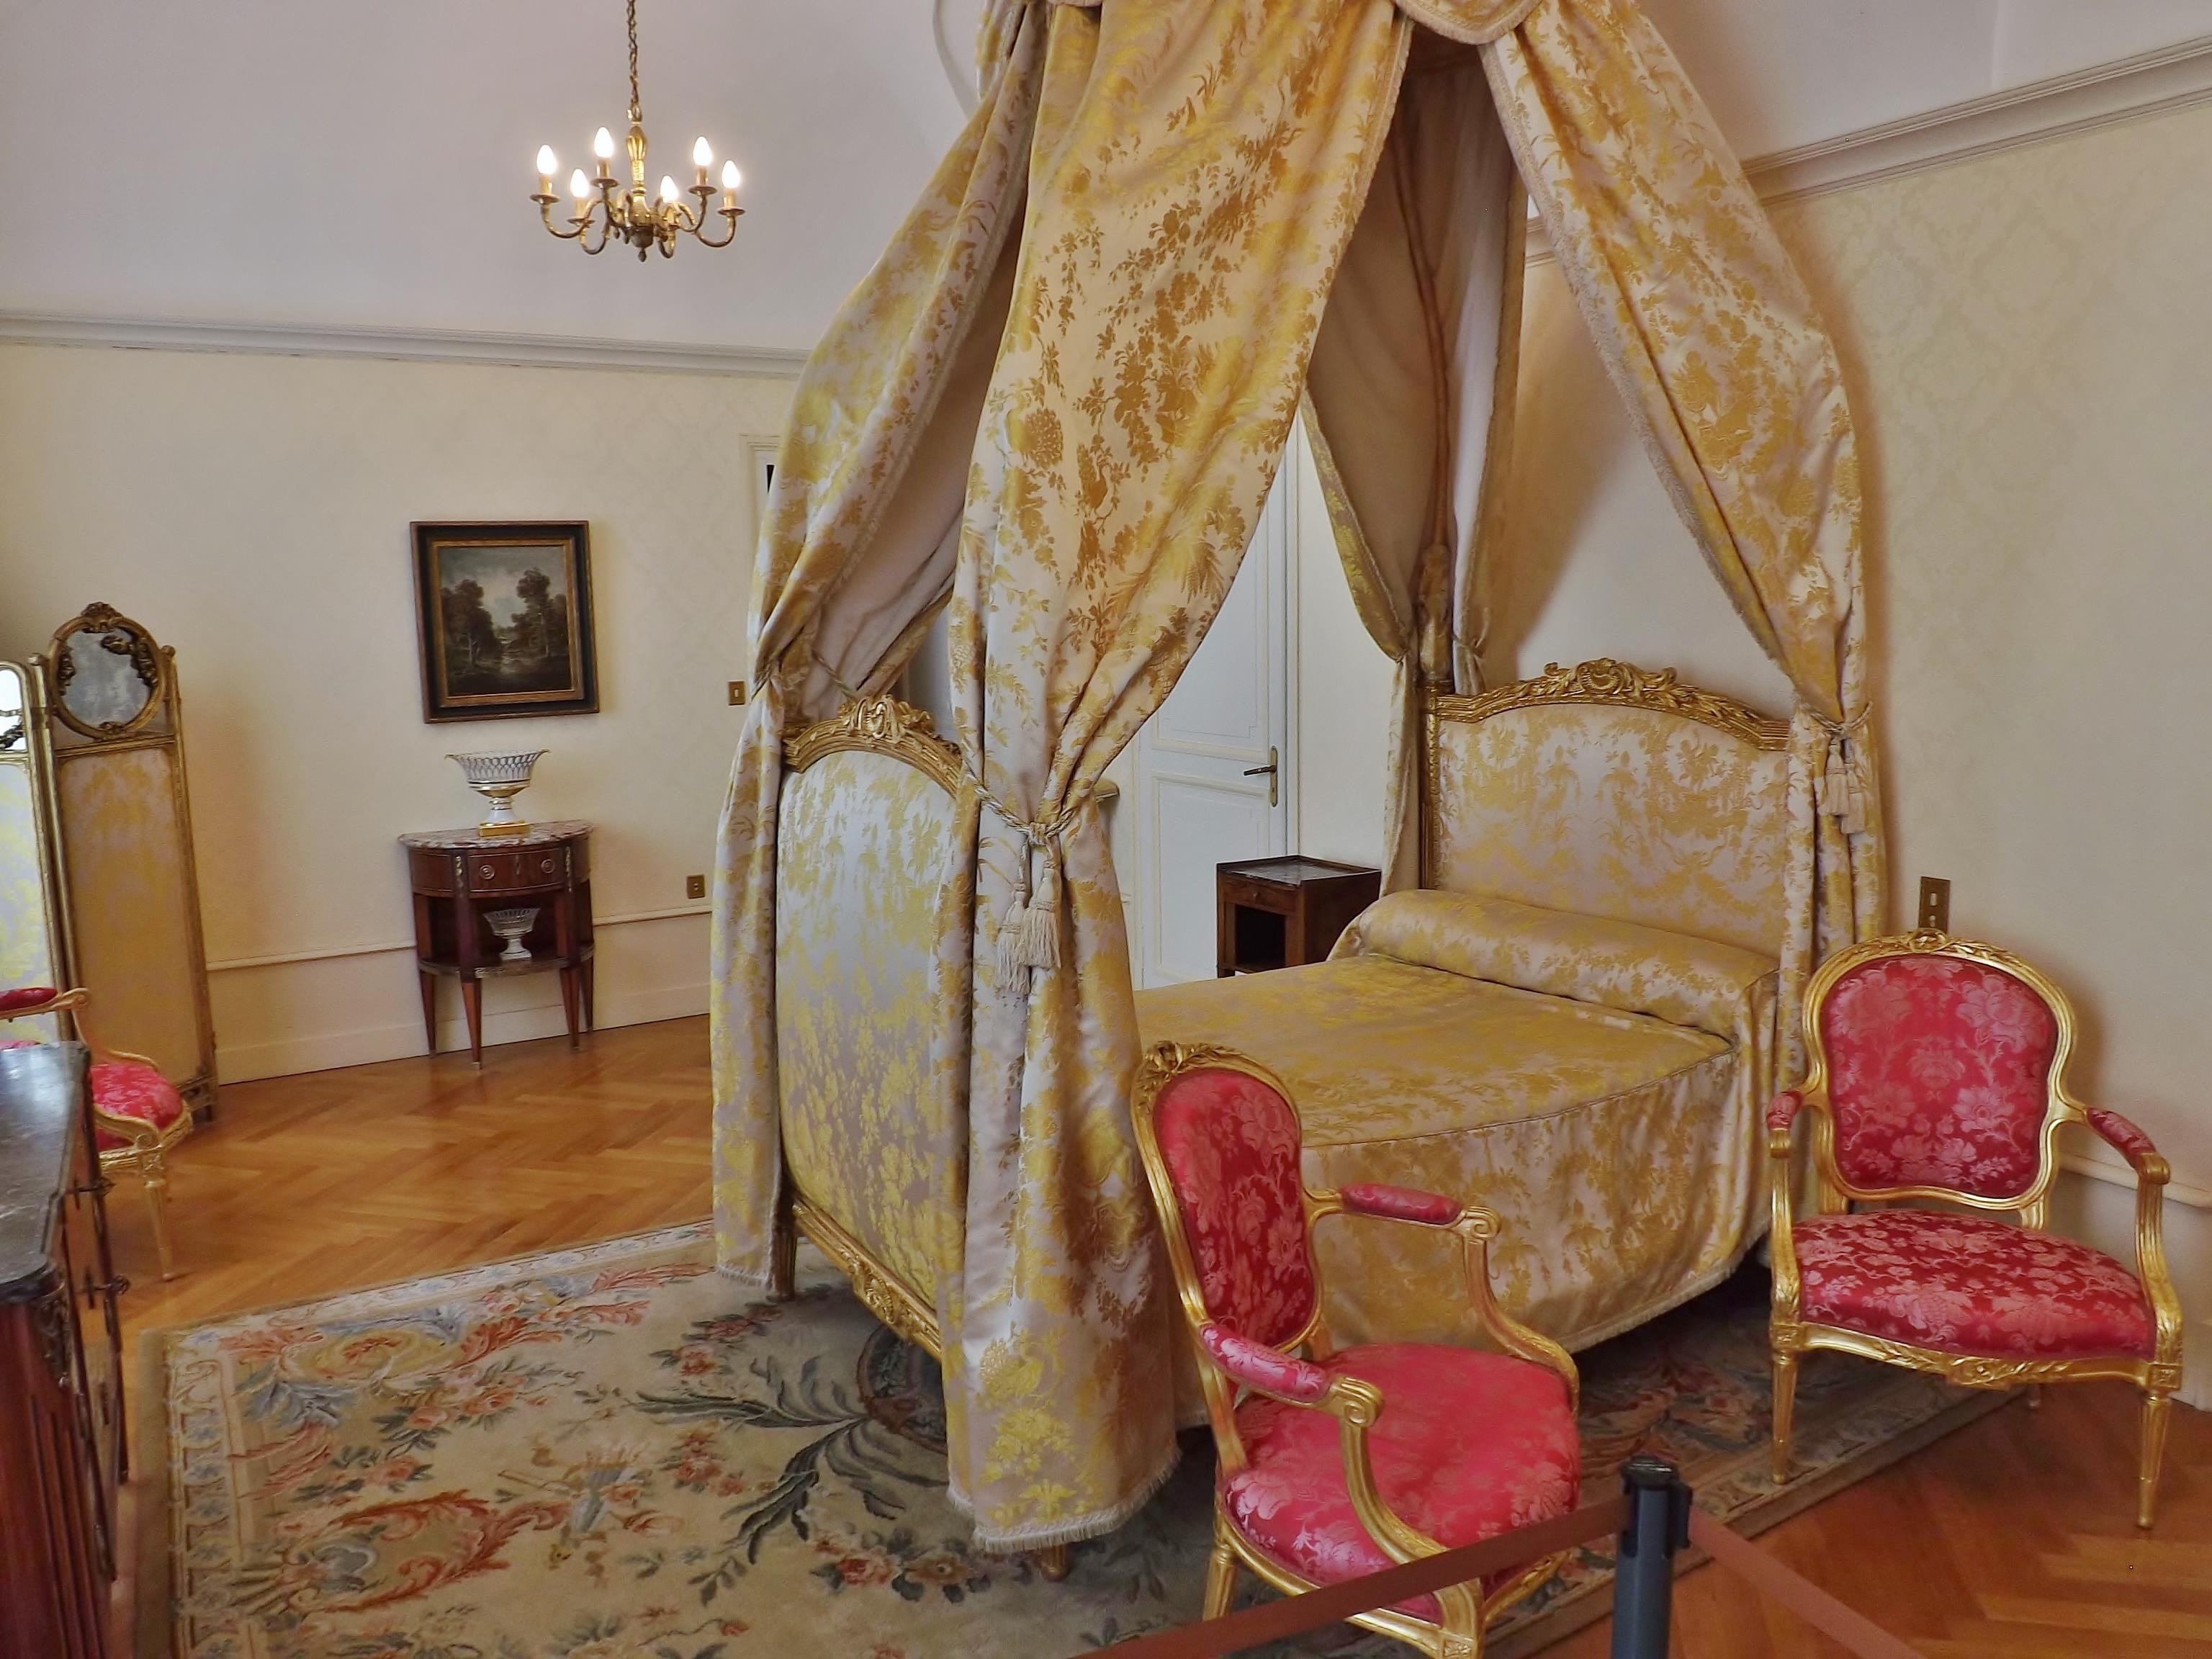 File:Ancienne chambre, château de Chambéry (2014).JPG ...